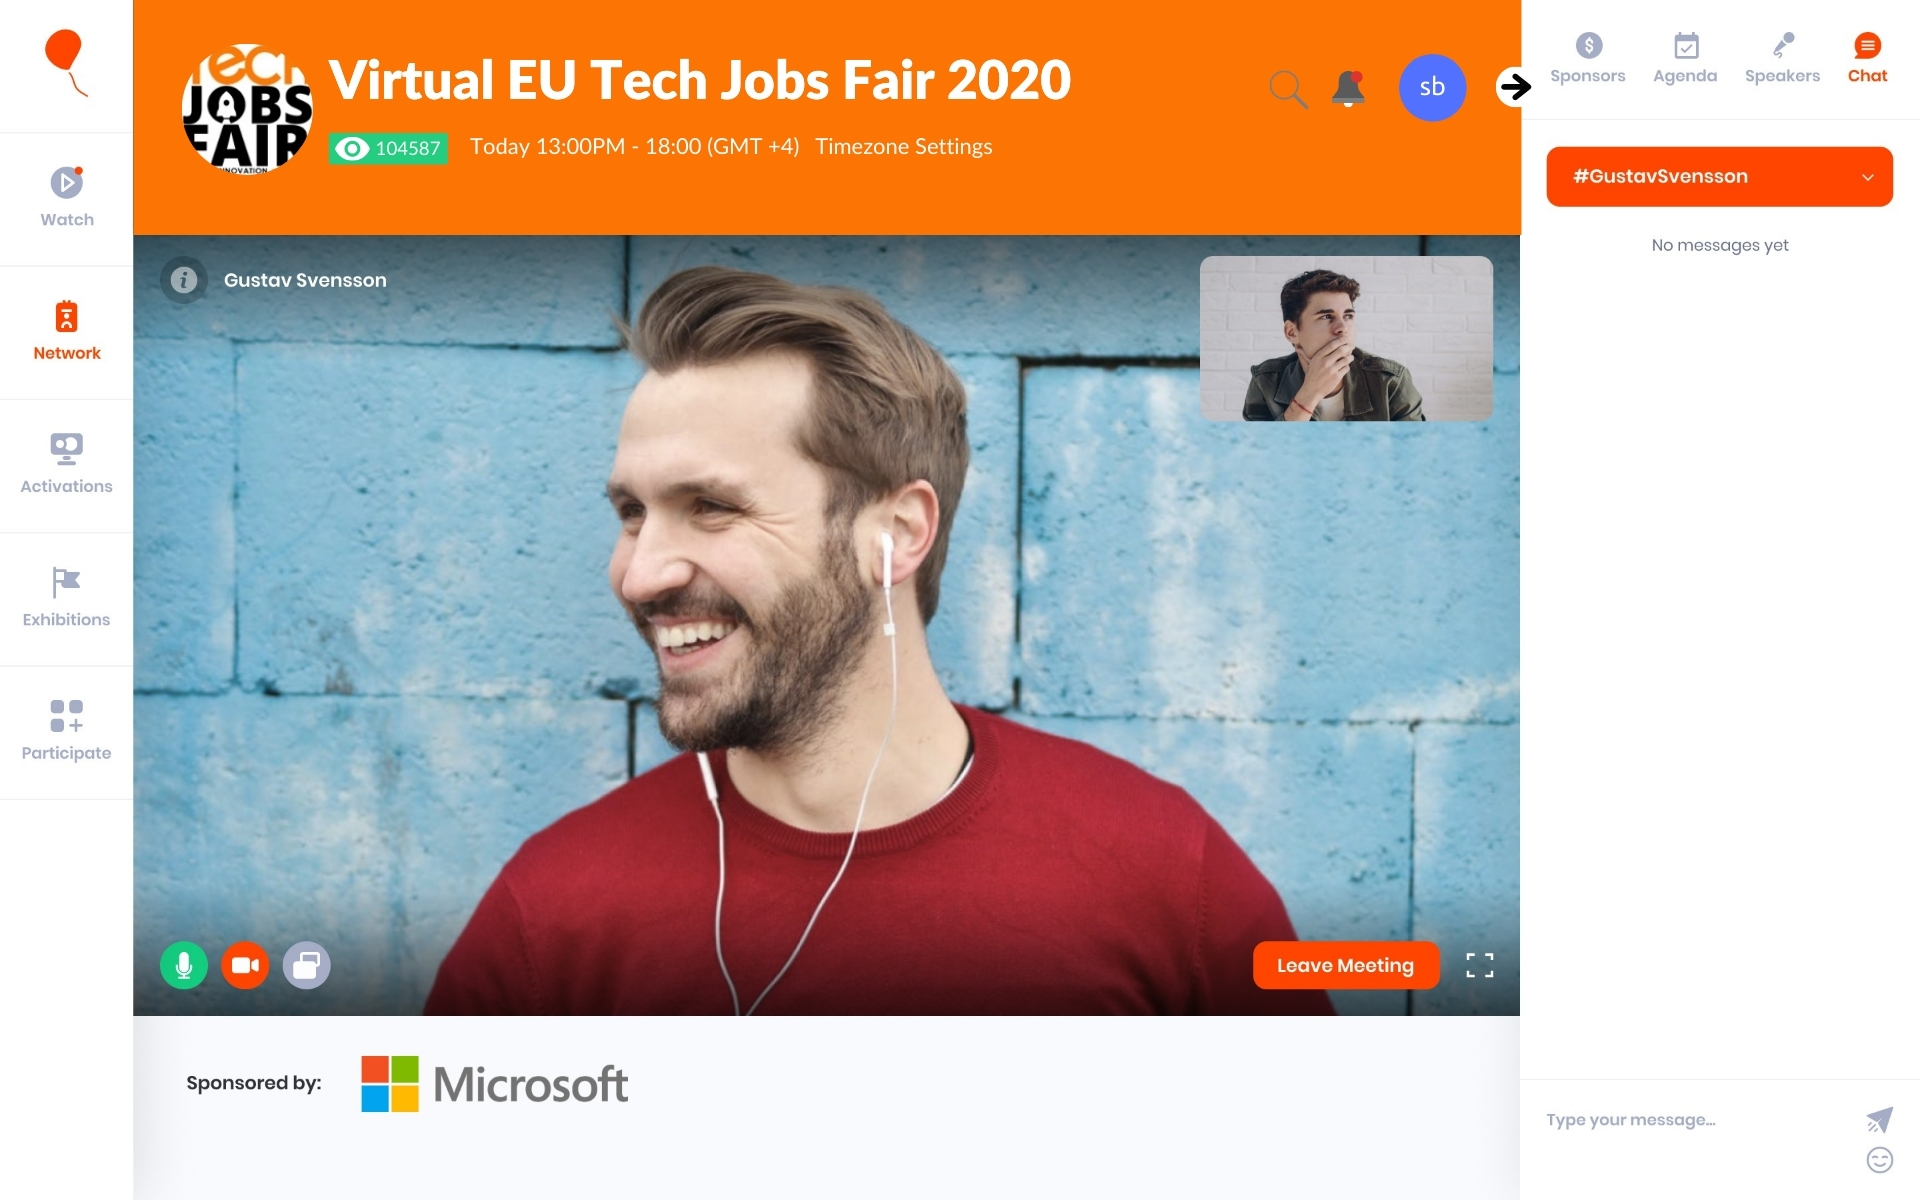 Networking at Virtual TJF 2020